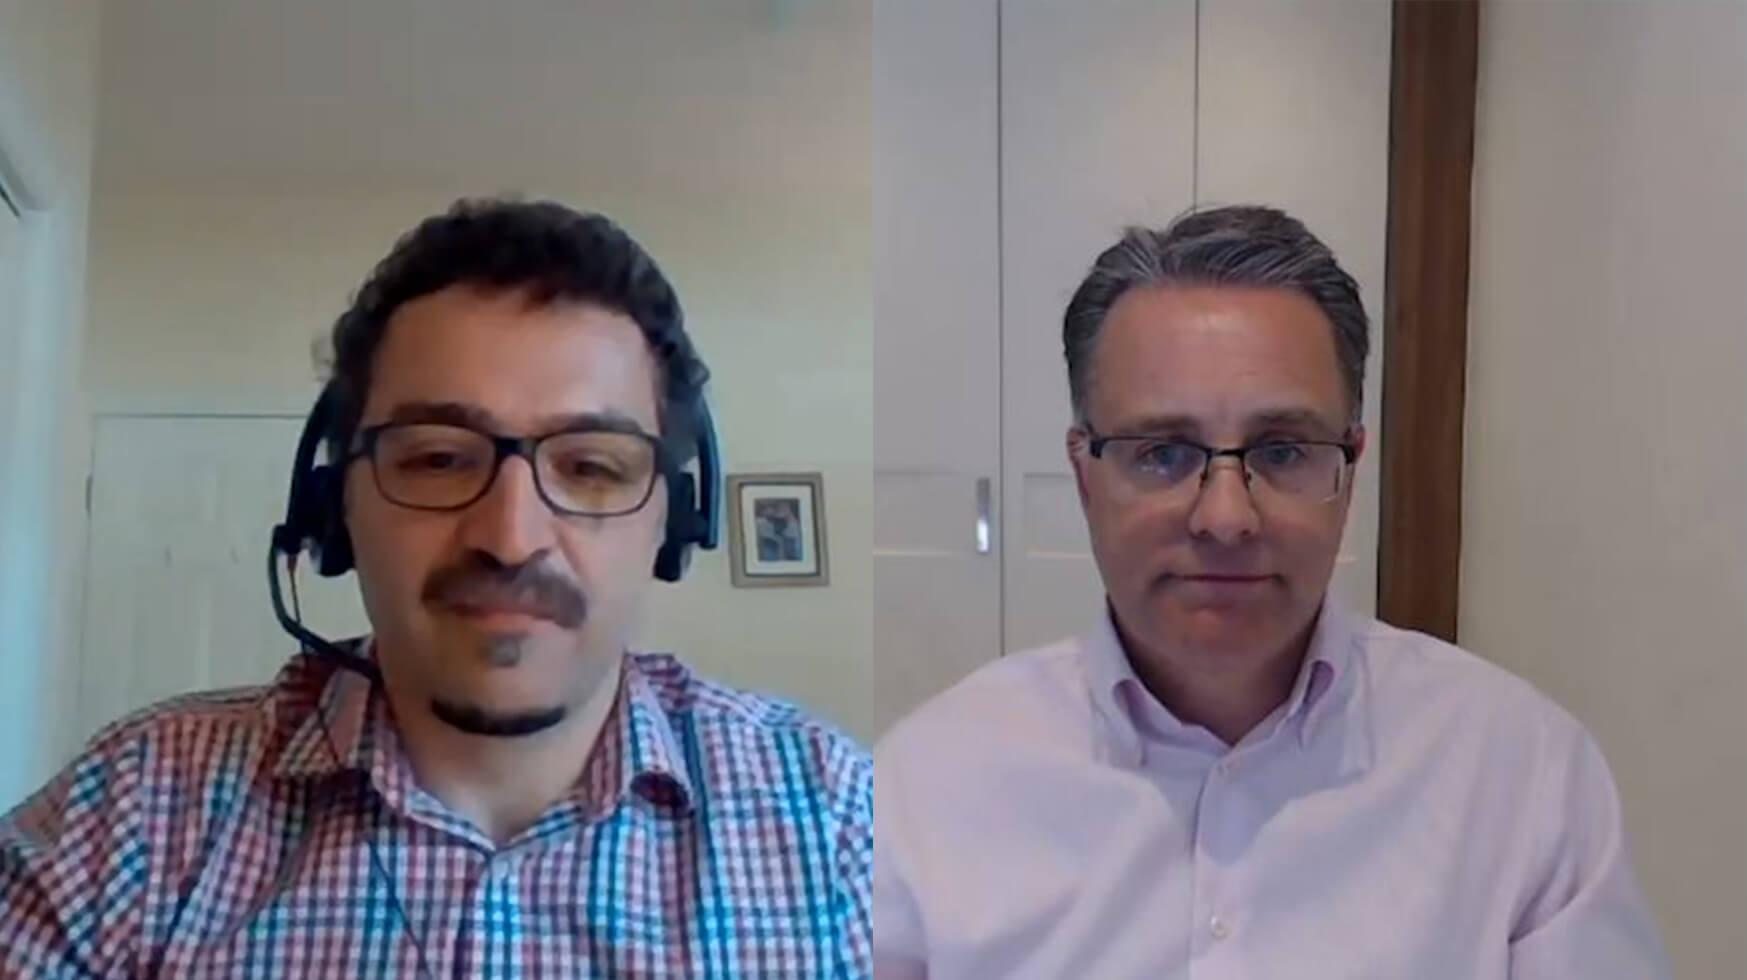 Matt Norton – S3 Connected Health – Digital health solutions and SaMD_2021